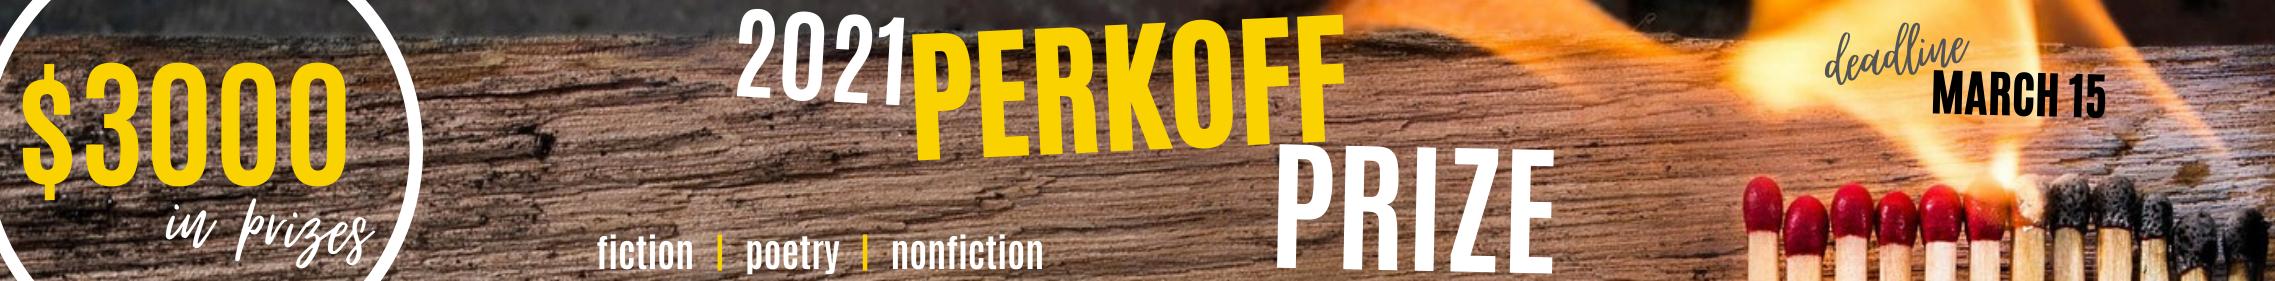 2021 Perkhoff Prize Header